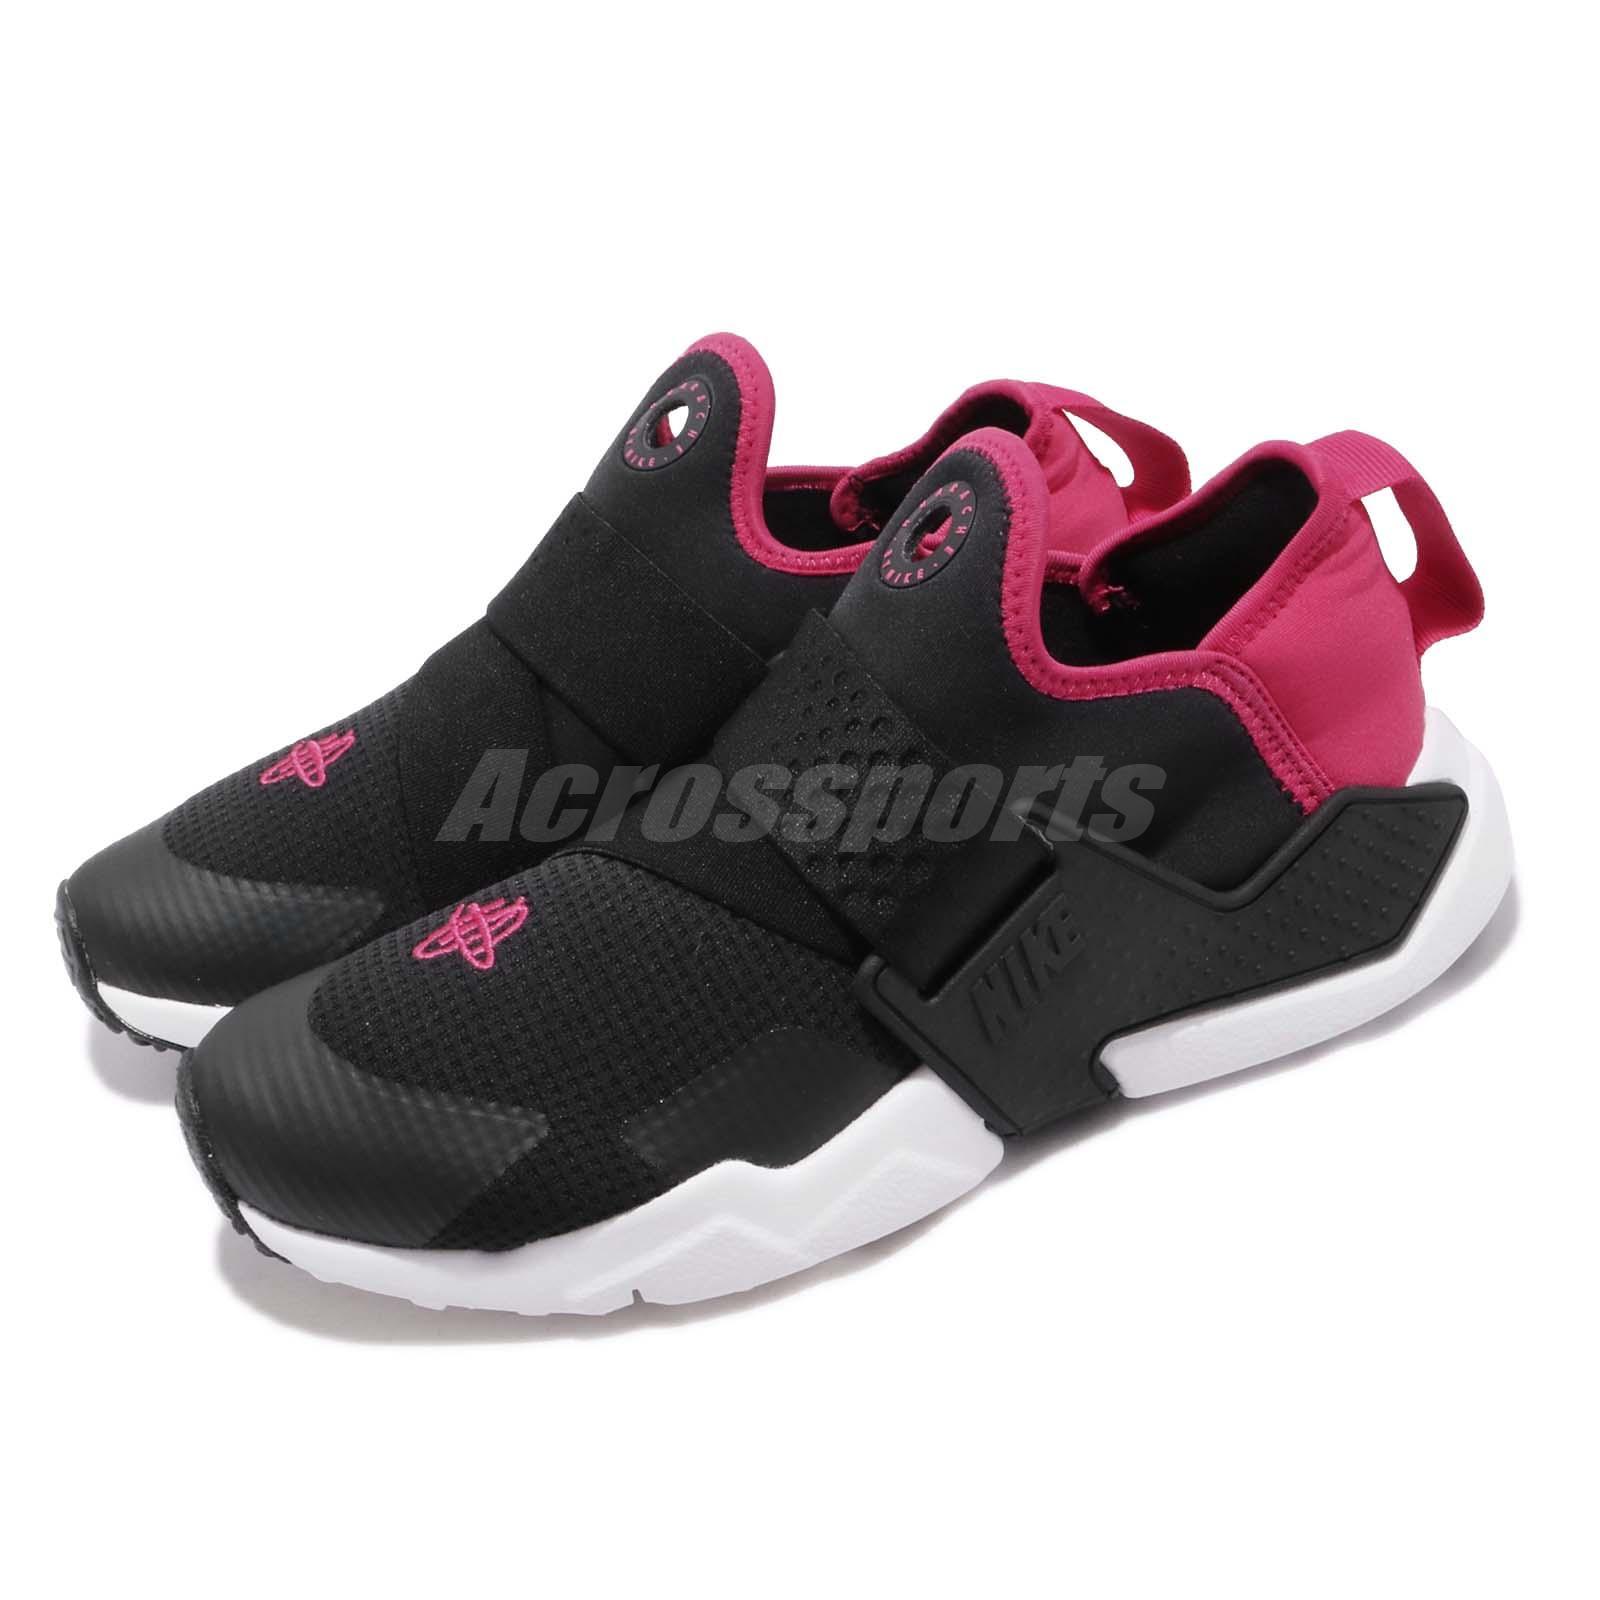 e090d5f7dac2e Details about Nike Huarache Extreme GS Black Pink White Kid Youth Women  Slip On AQ0575-011